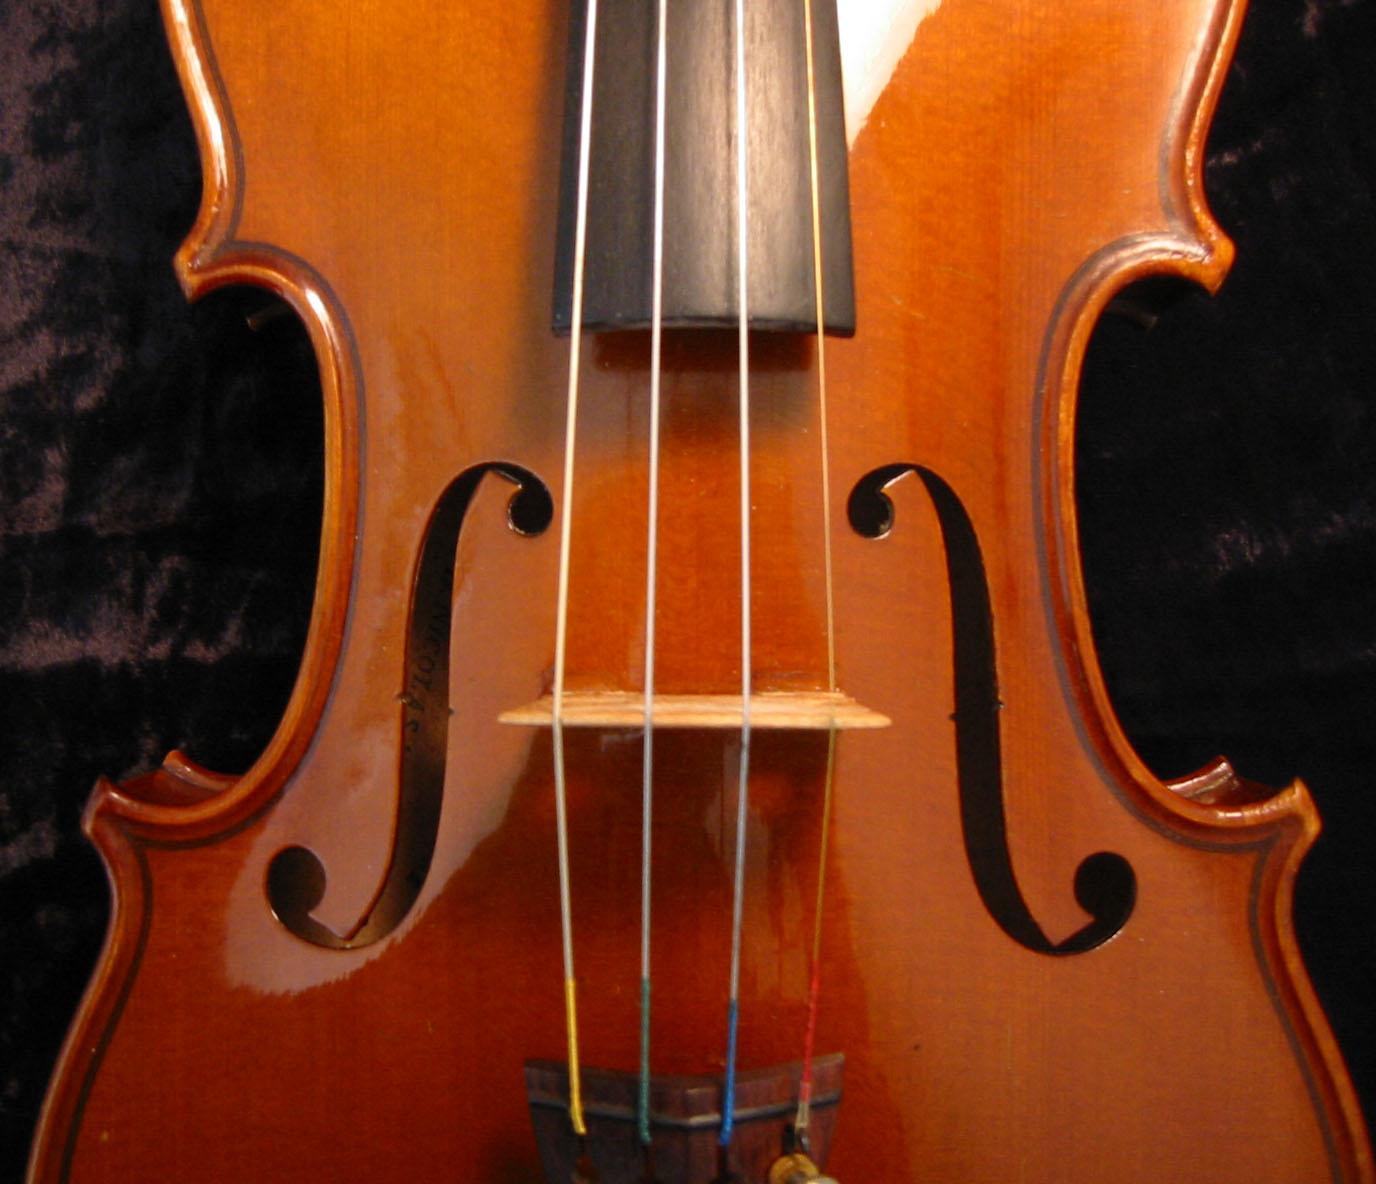 http://1.bp.blogspot.com/_Jbp5VBrAaqo/S_SmepIgWvI/AAAAAAAAAYA/RJPCe1Quyp0/s1600/Violin1.jpg